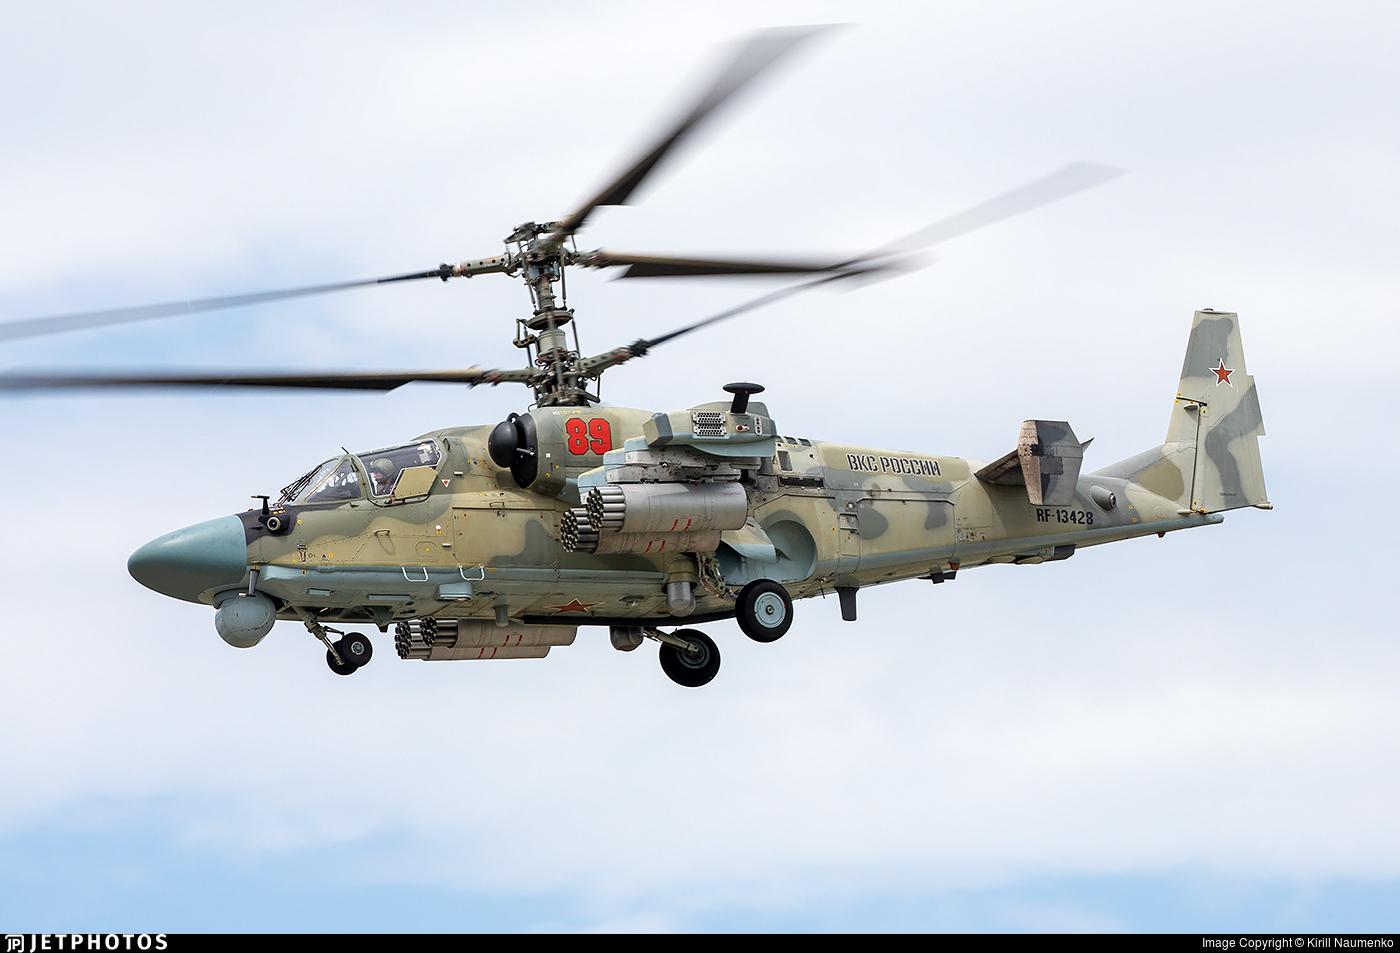 RF-13428 - Kamov Ka-52 Alligator - Russia - Air Force